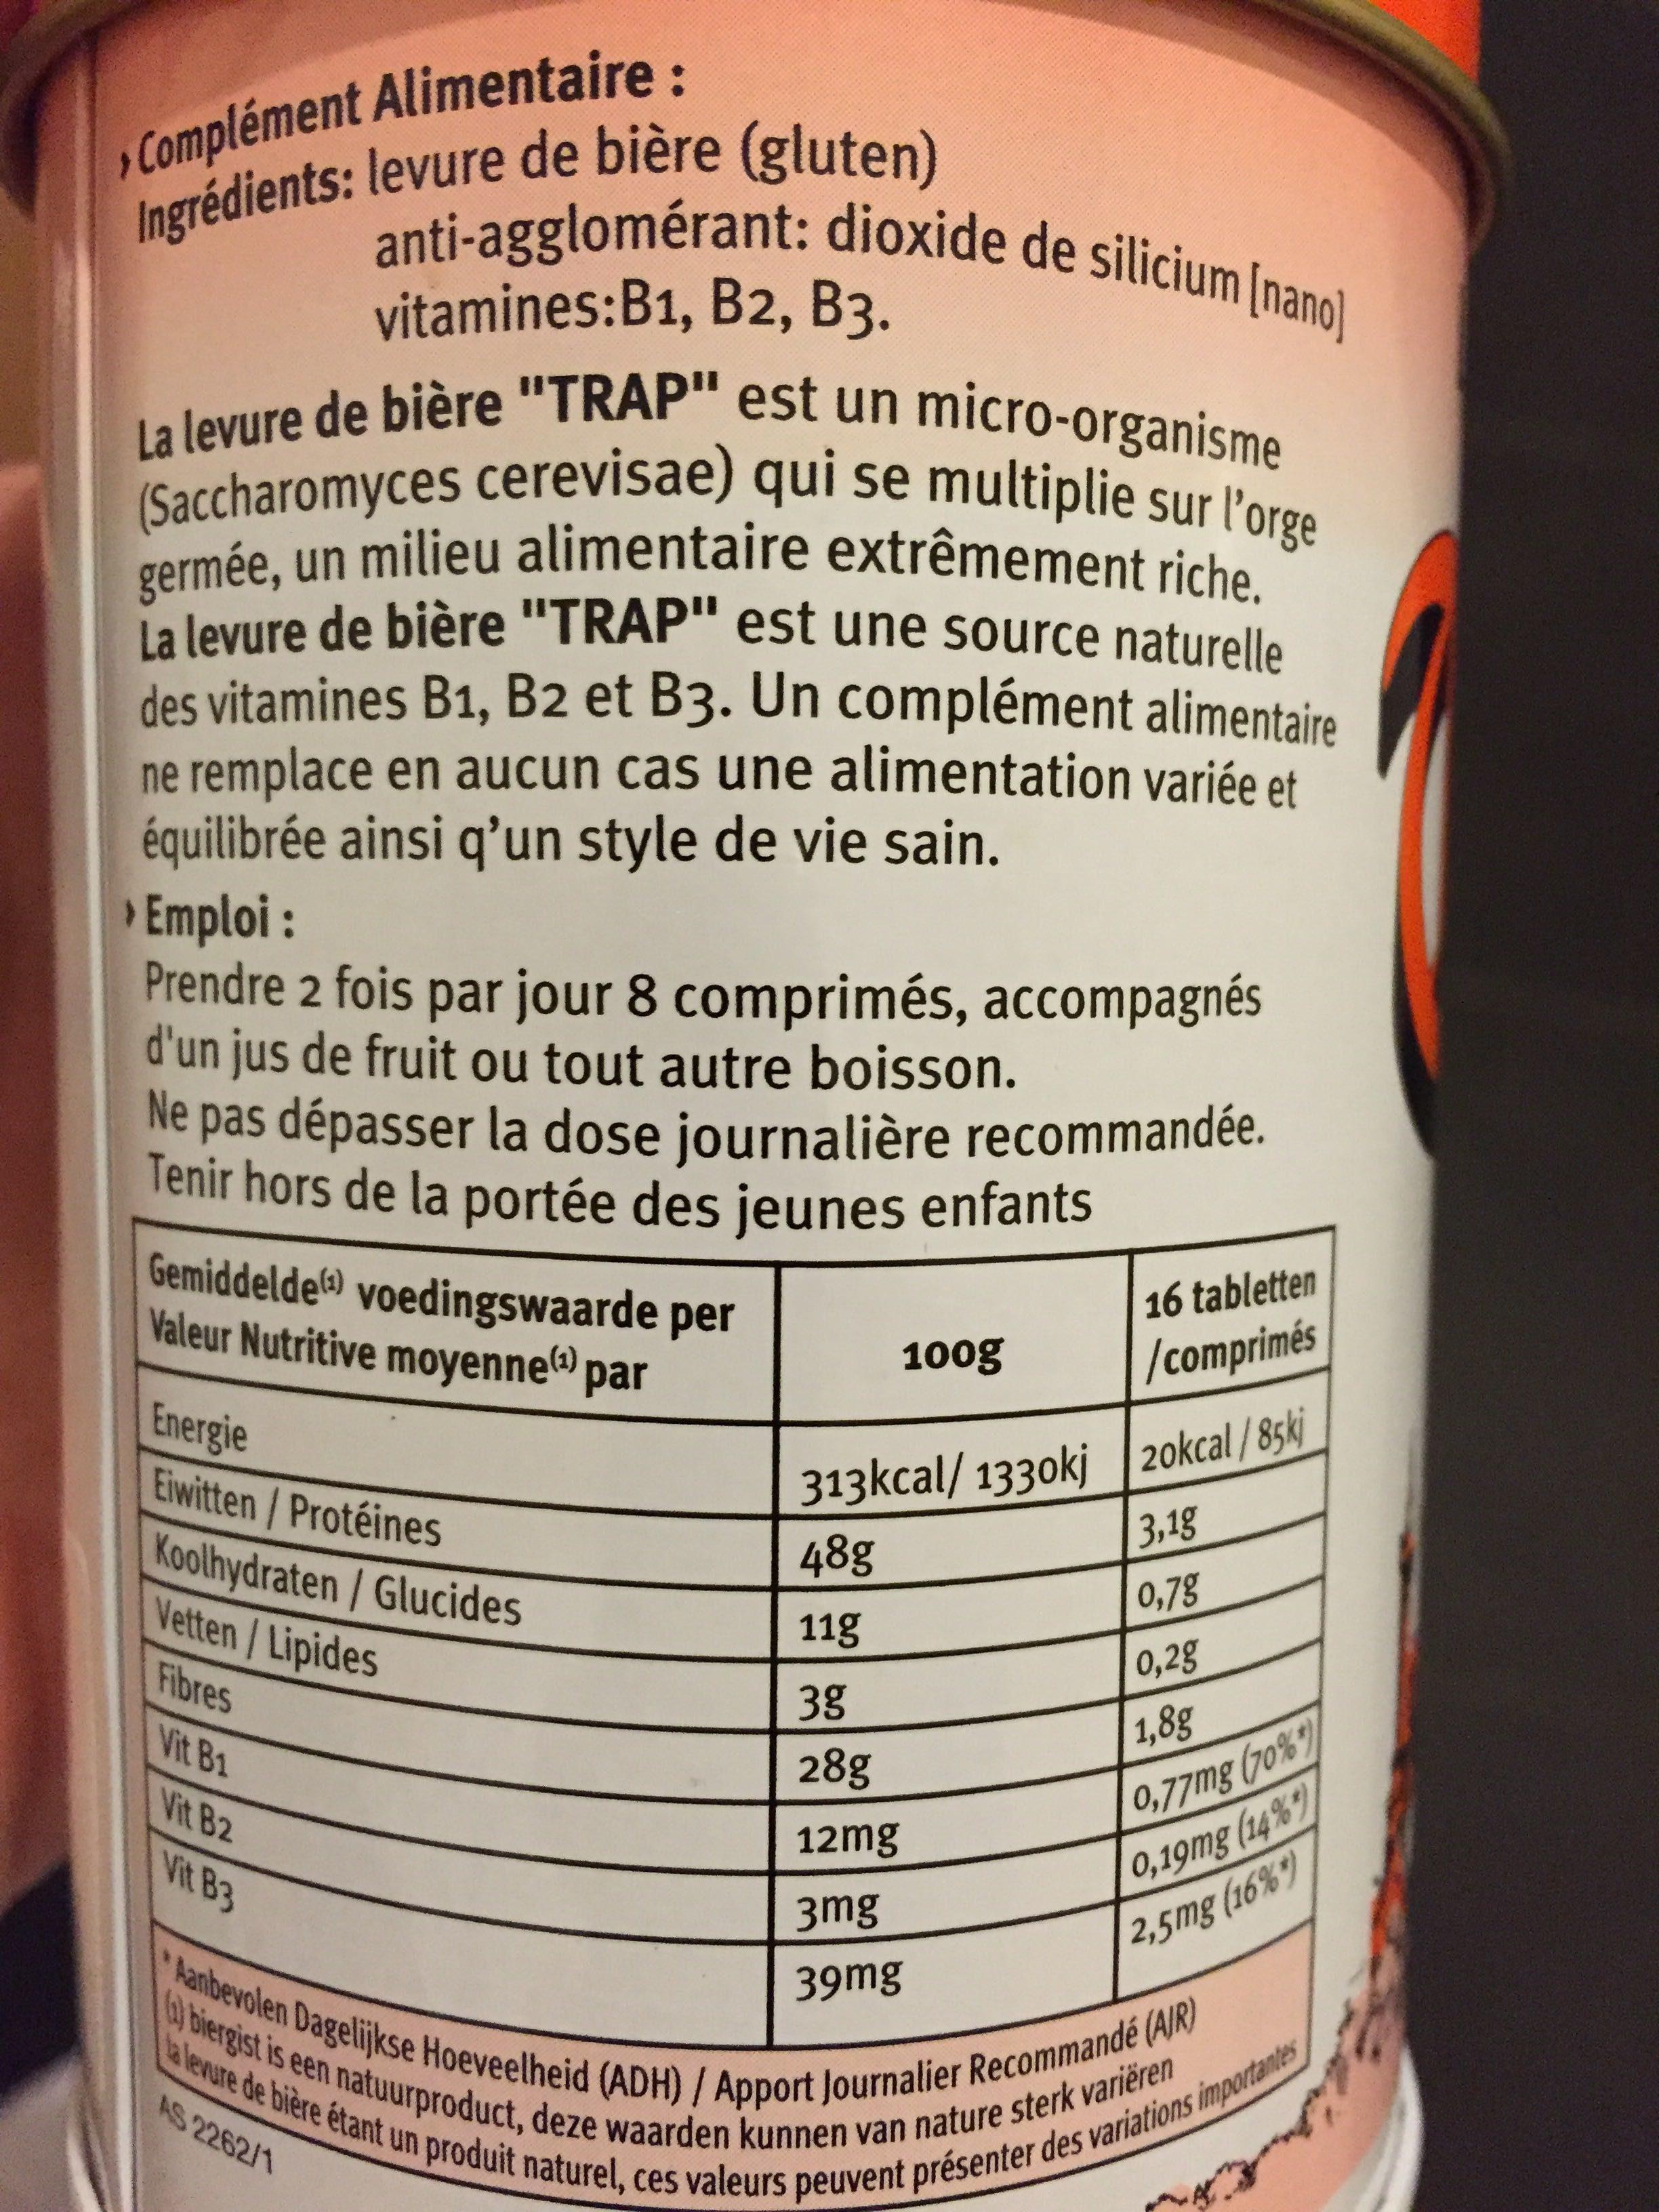 Trap Biergist Tabletten - Product